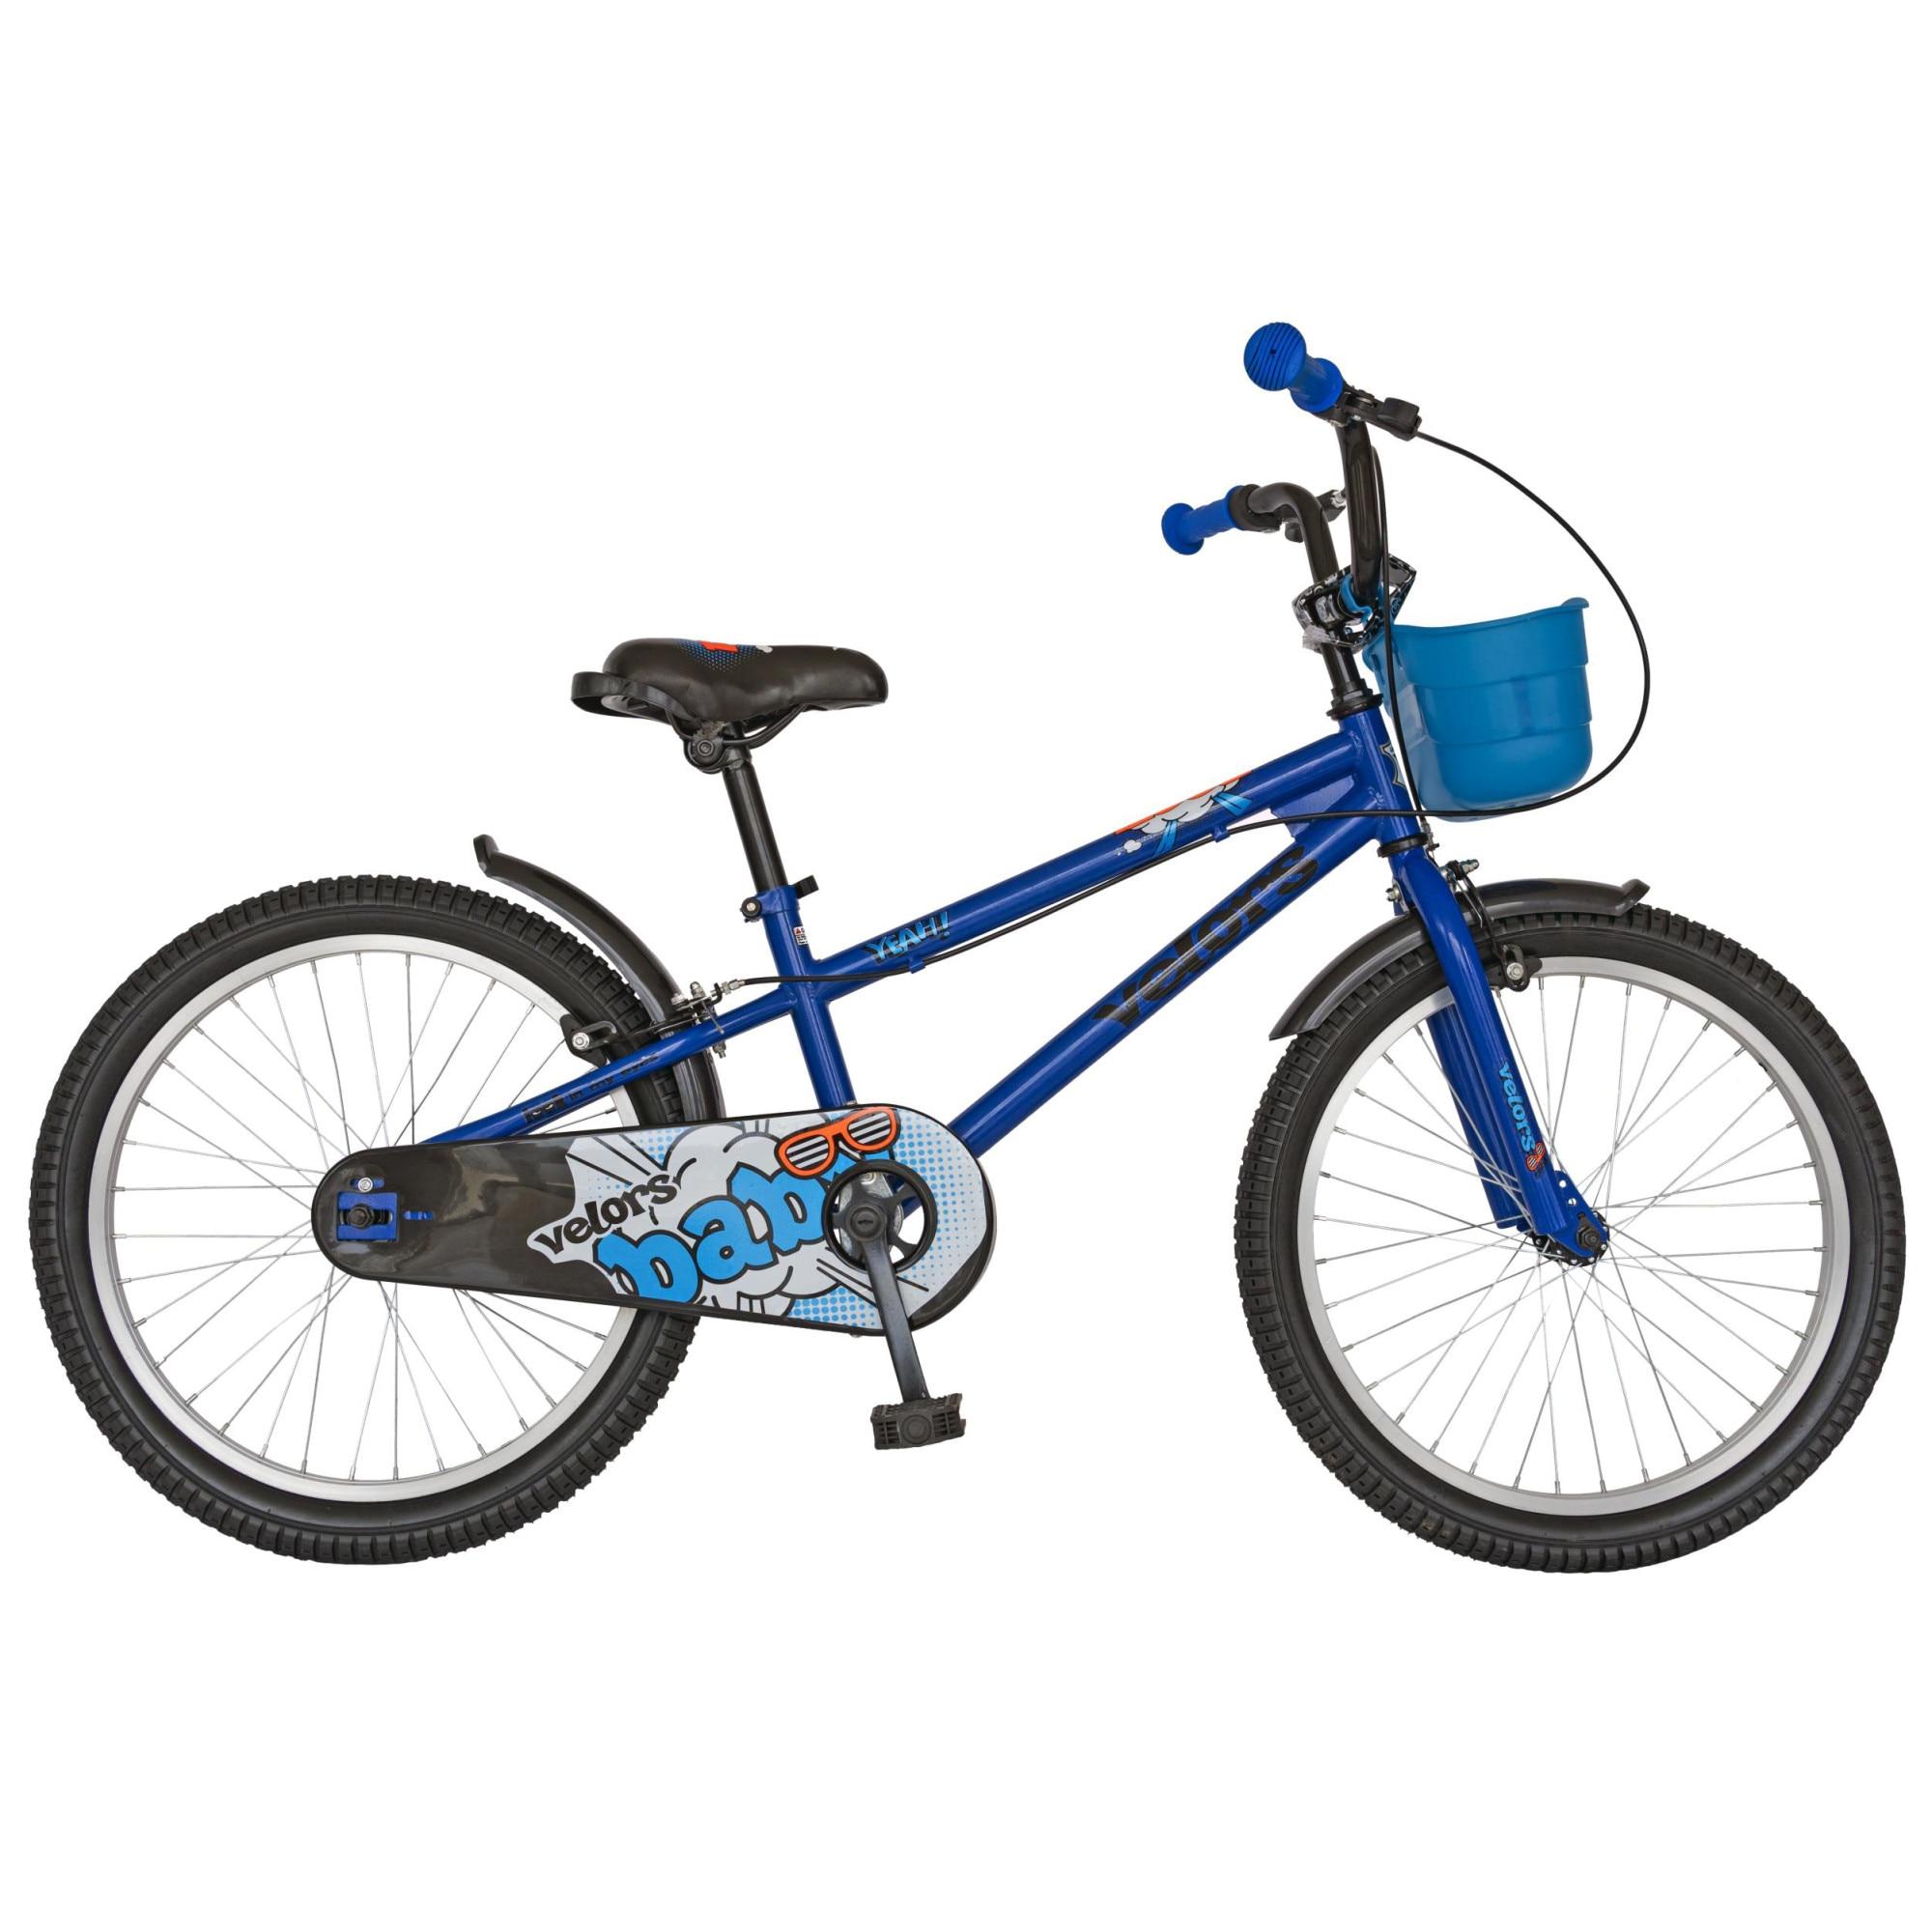 Fotografie Bicicleta Velors V2001A pentru copii 7-9ani, Albastru